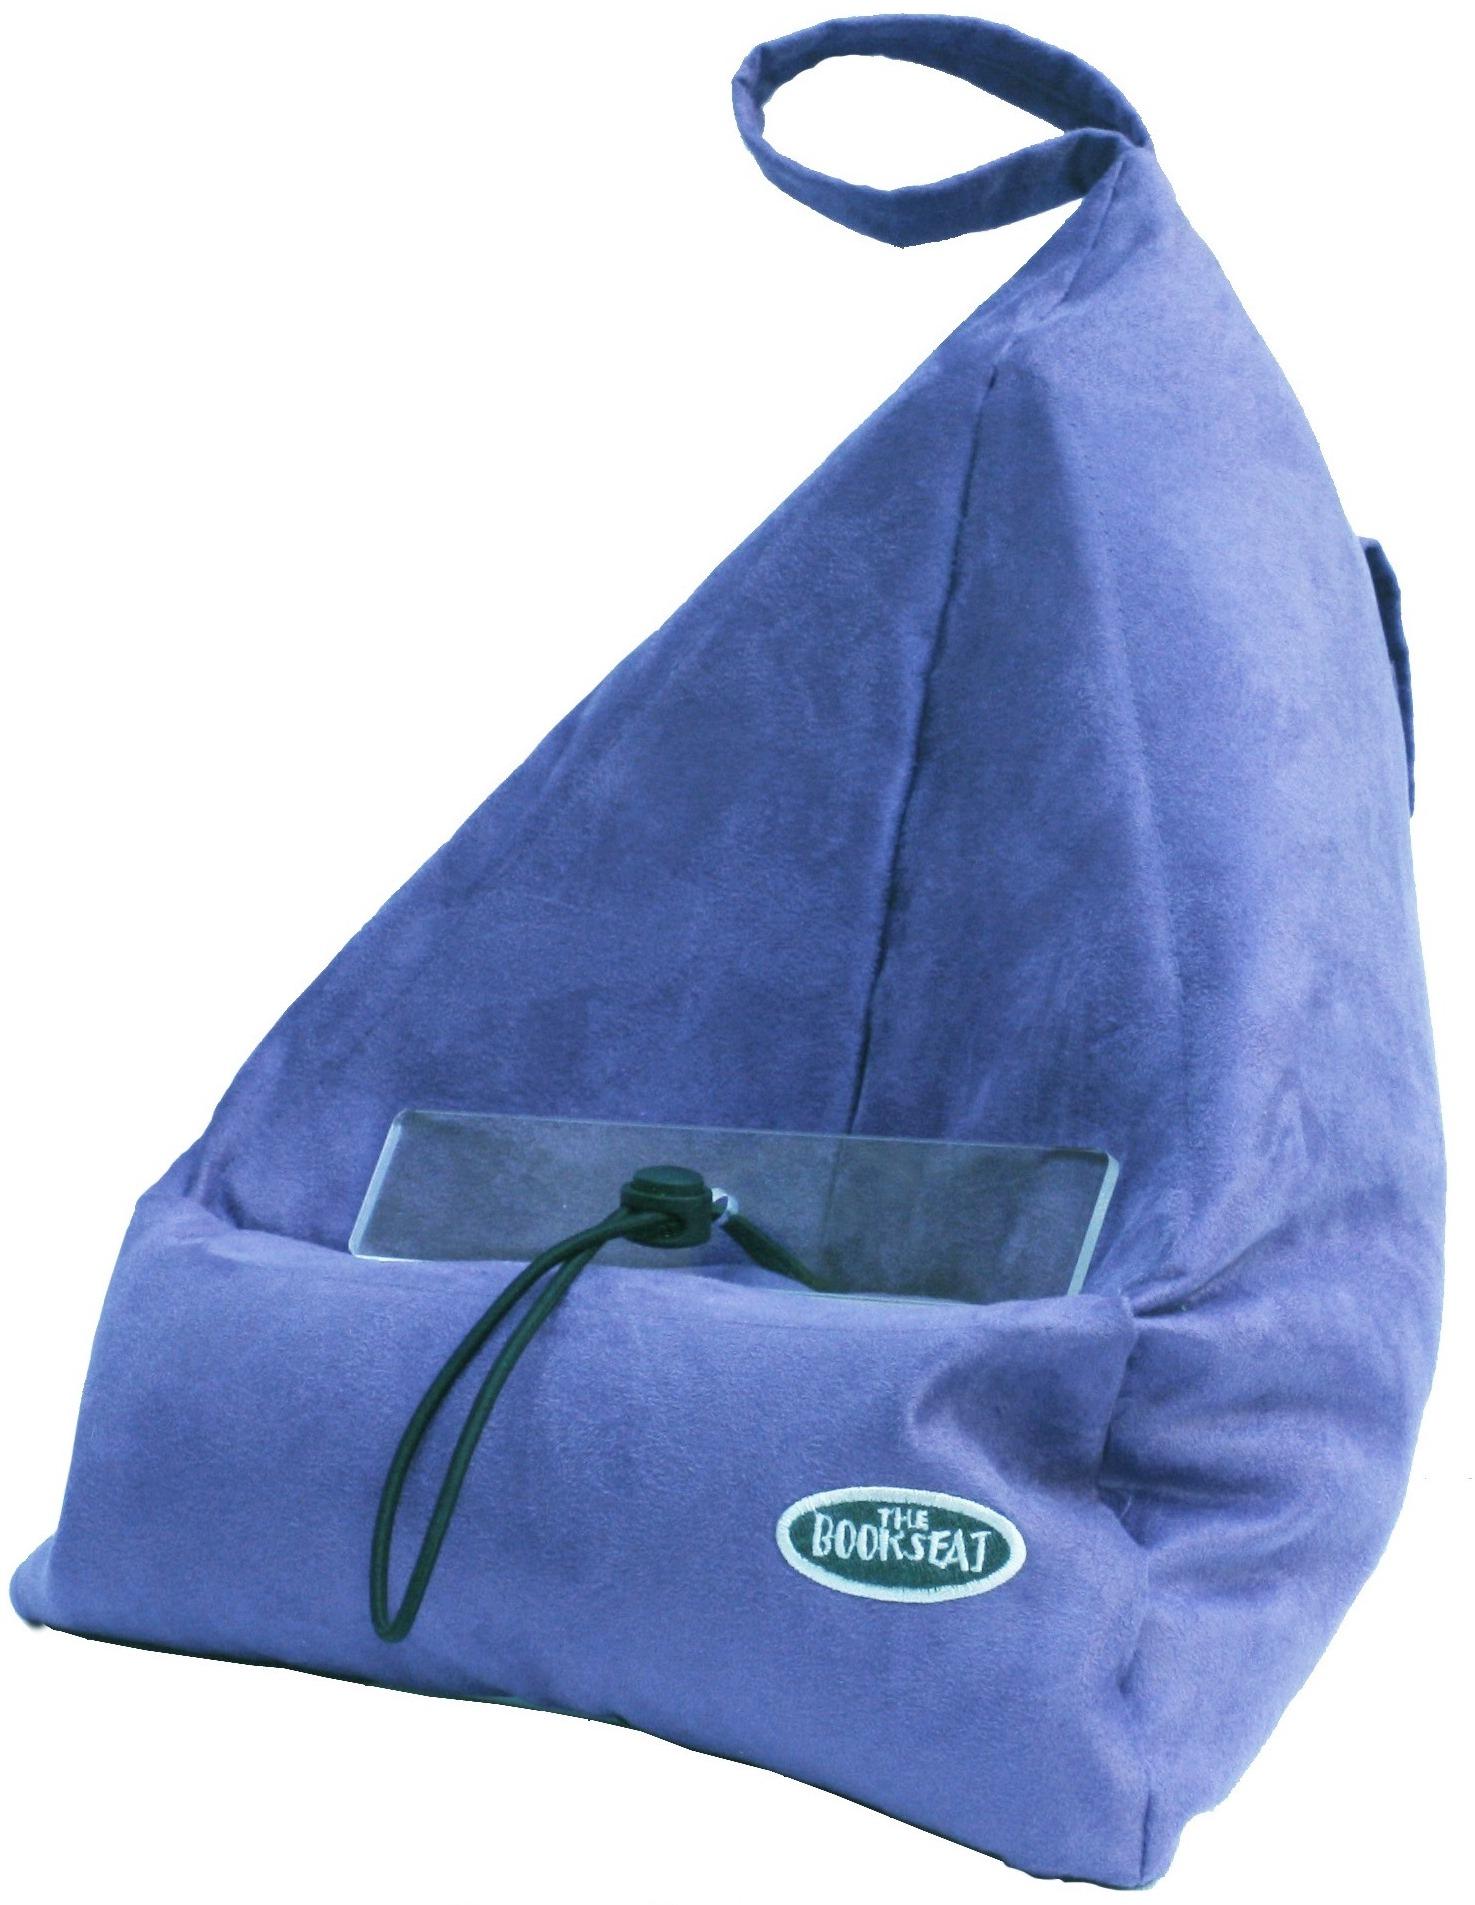 Blauw model - Book Seat (9346017000024)